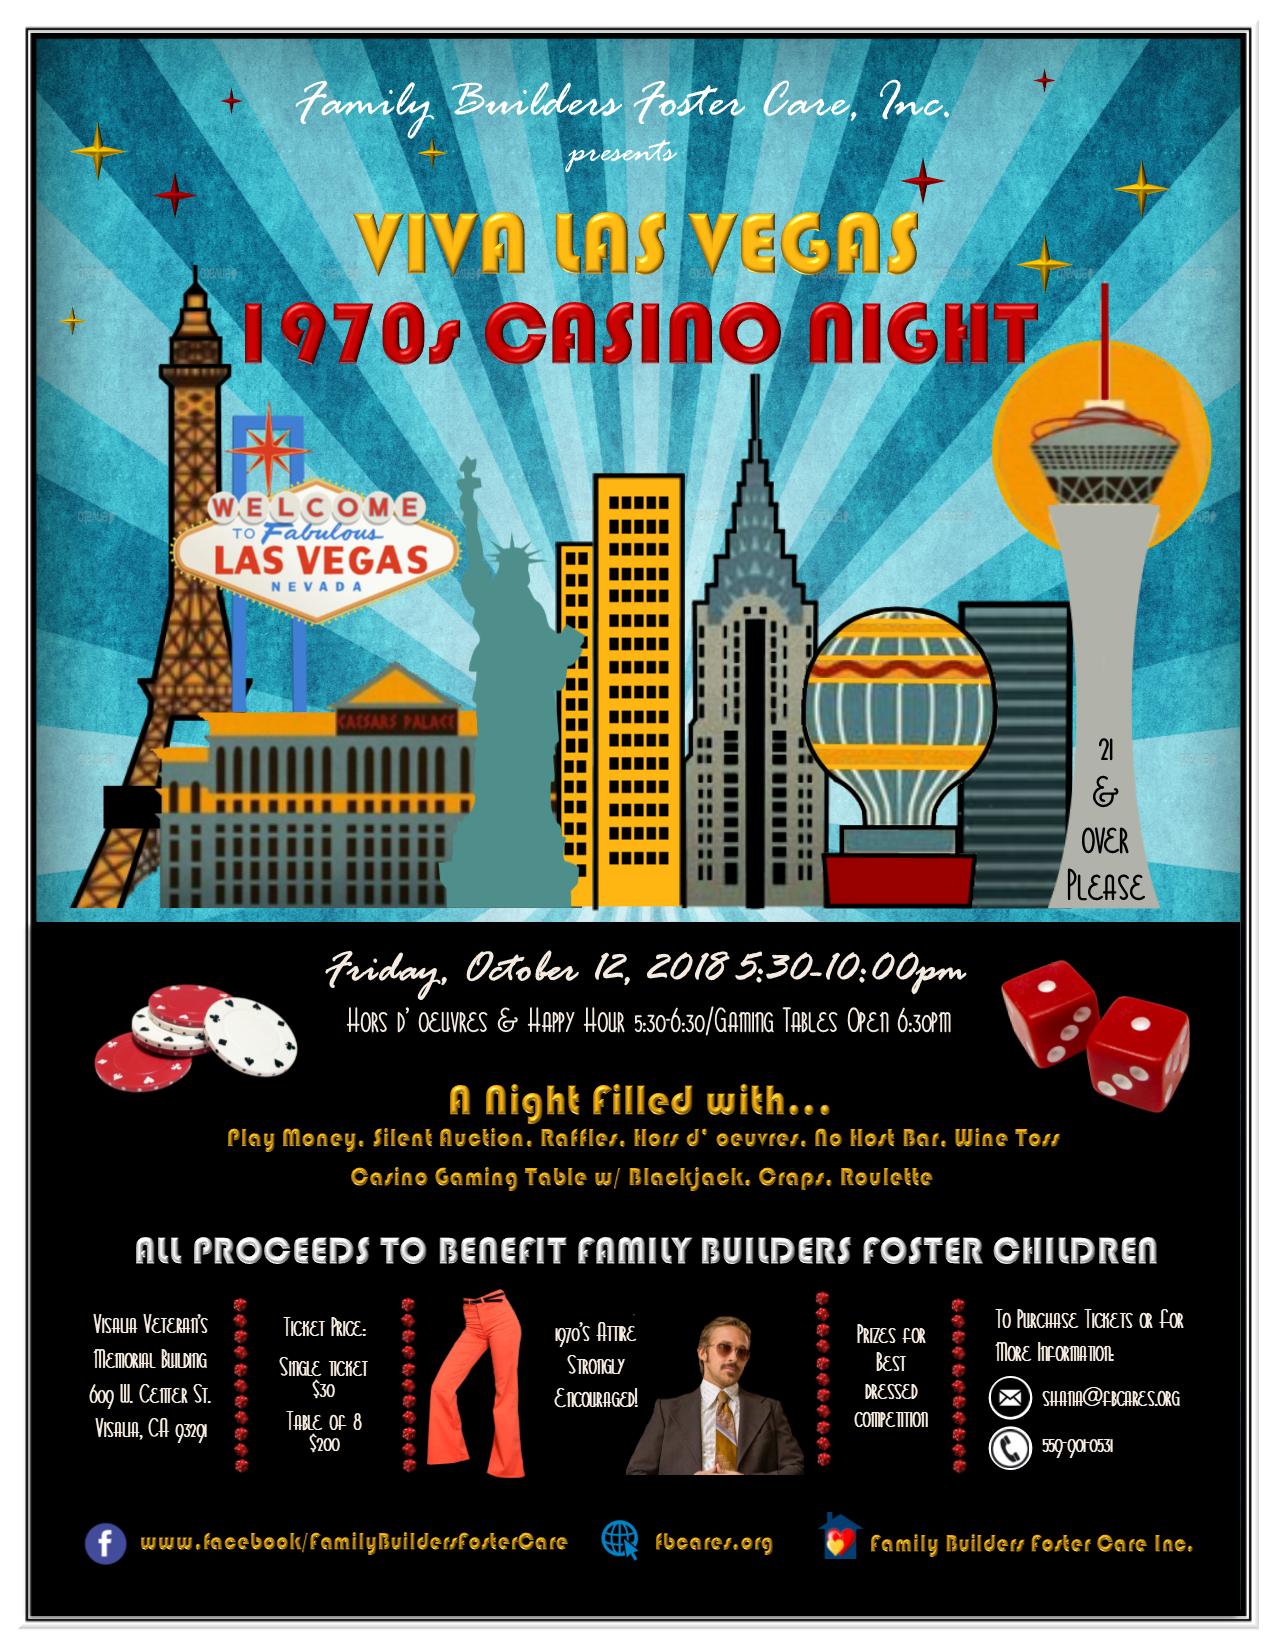 Flyer showing Vegas Fundraiser information